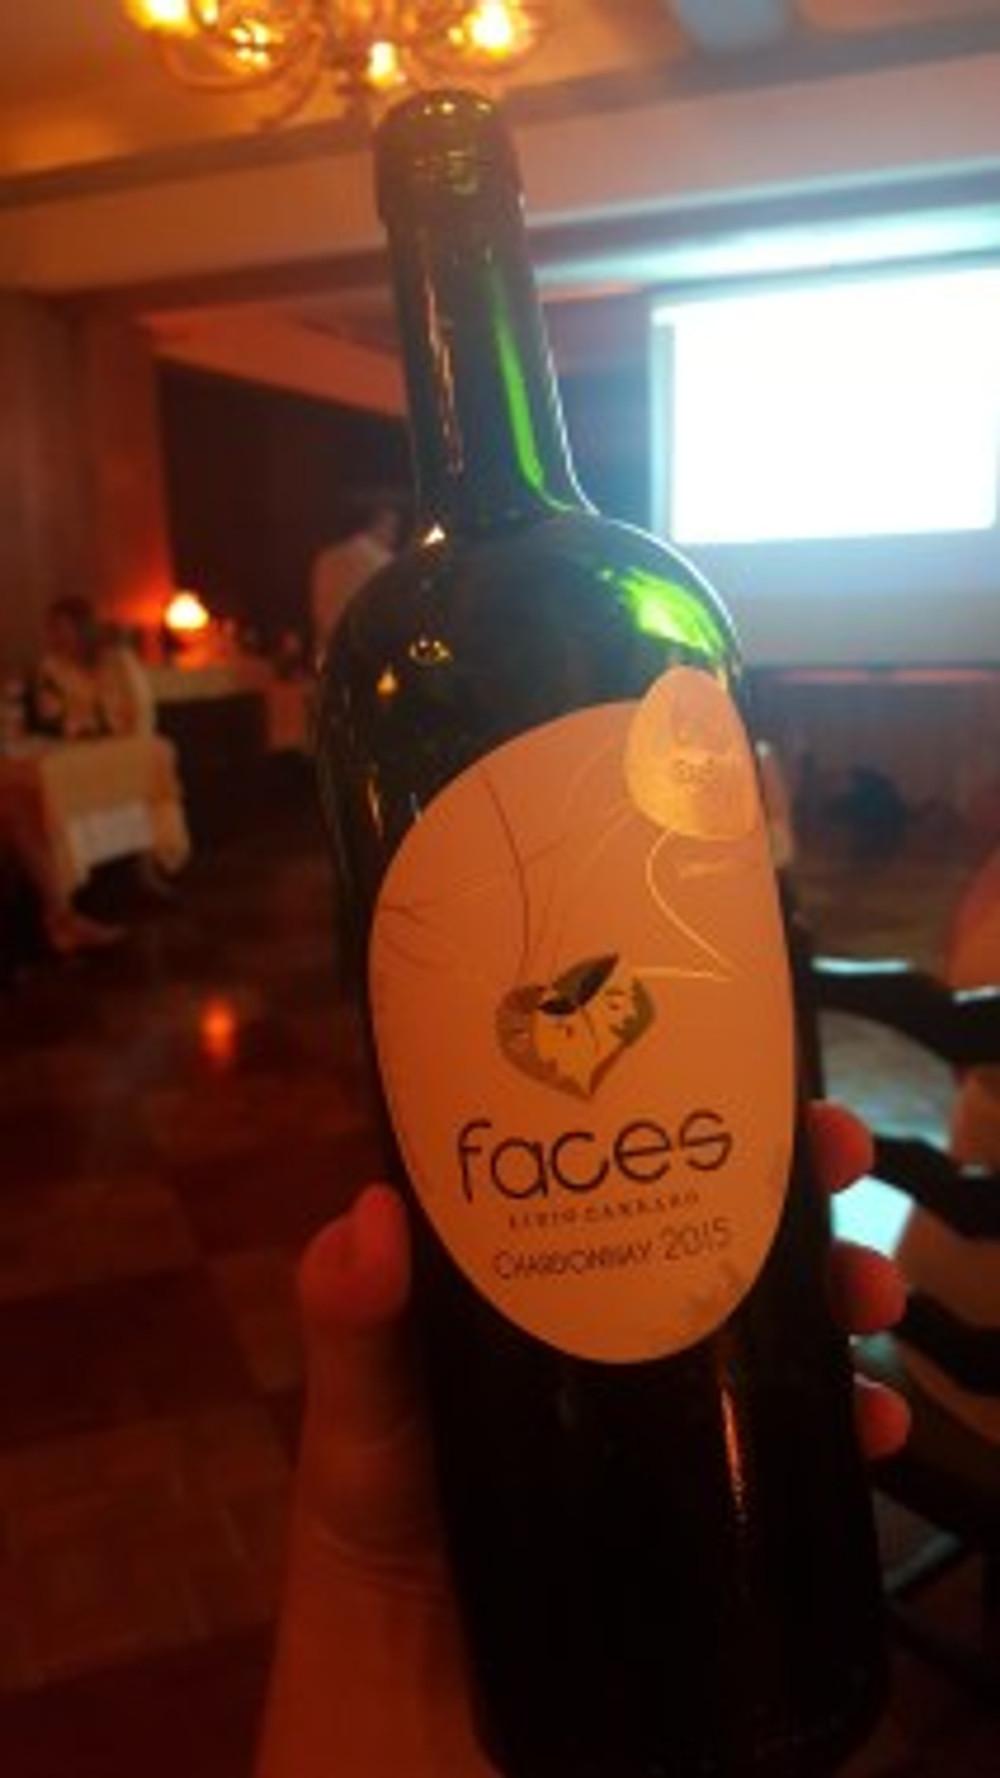 crisstilben cris pelomundo lidio carraro vinho olimpíadas vinhos (12)